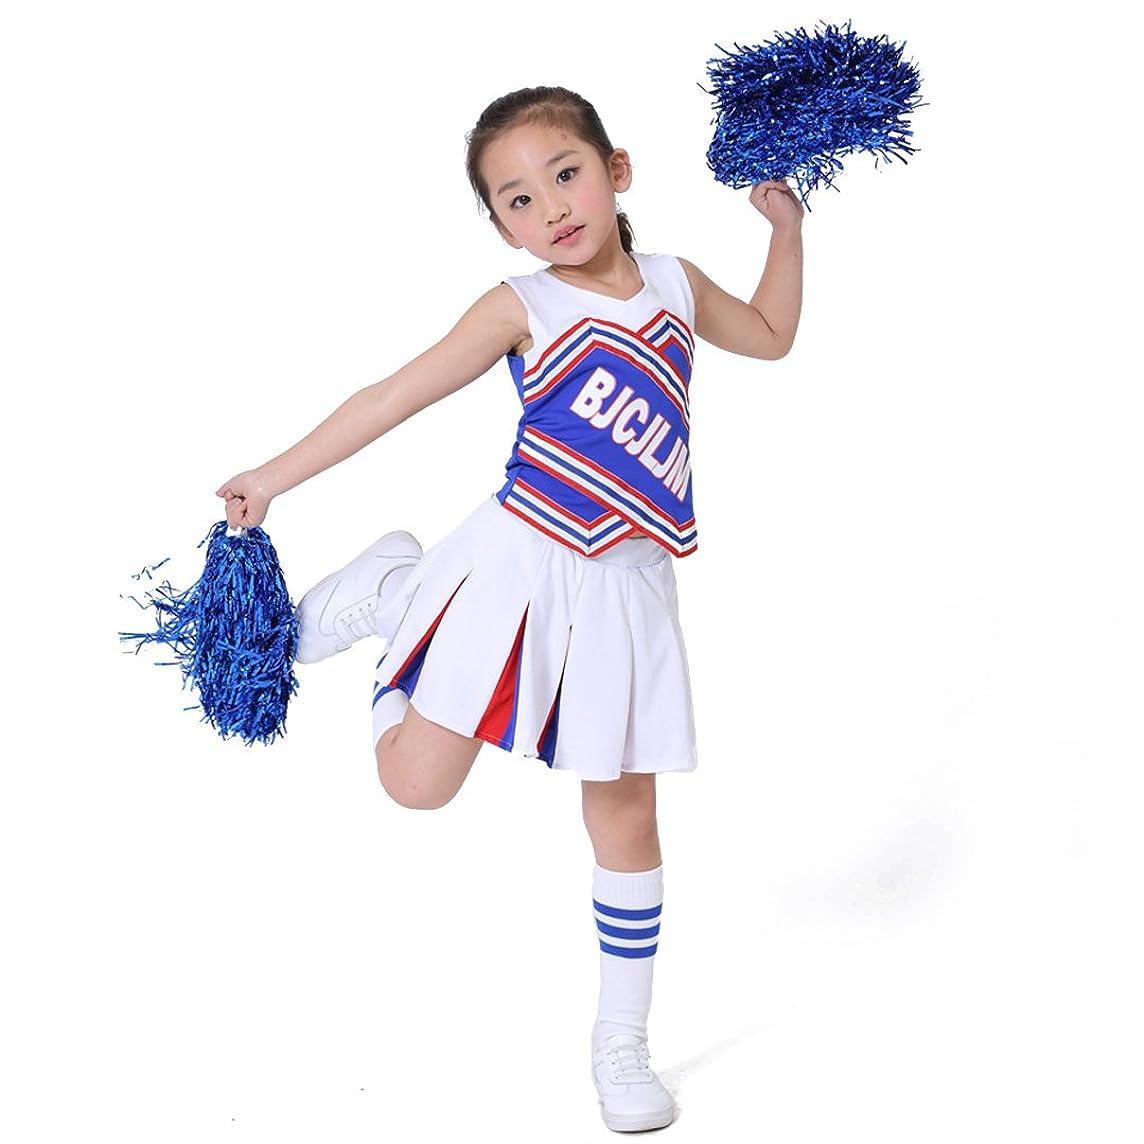 LOLANTA Children Girls Cheerleader Costume Cheerleading Outfit with Match Pom Poms Socks